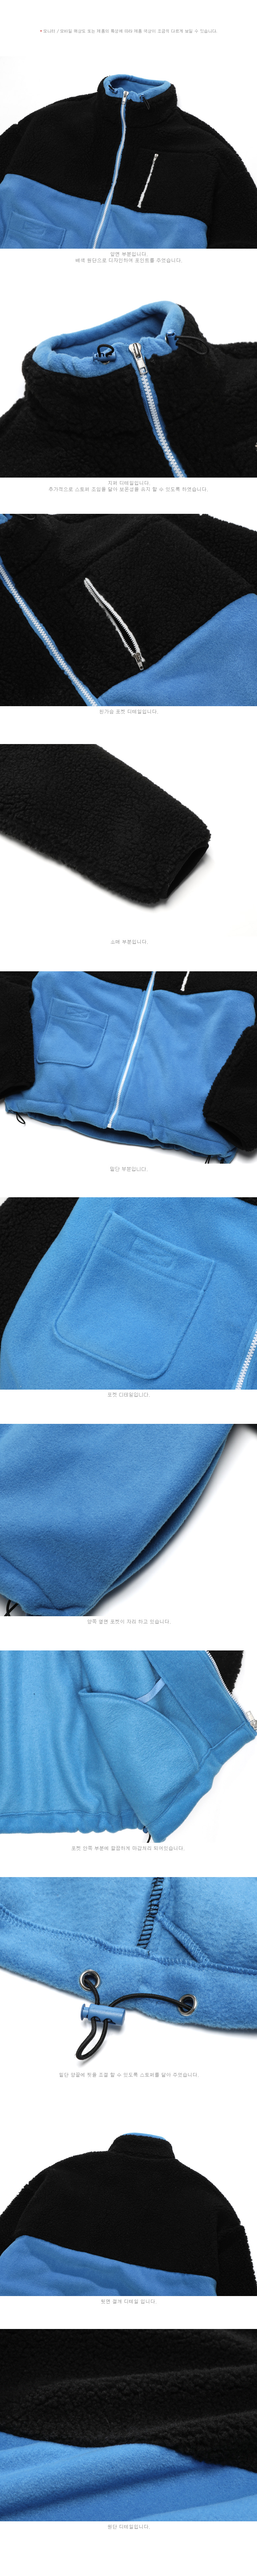 4270_detail_blue_ms_02.jpg